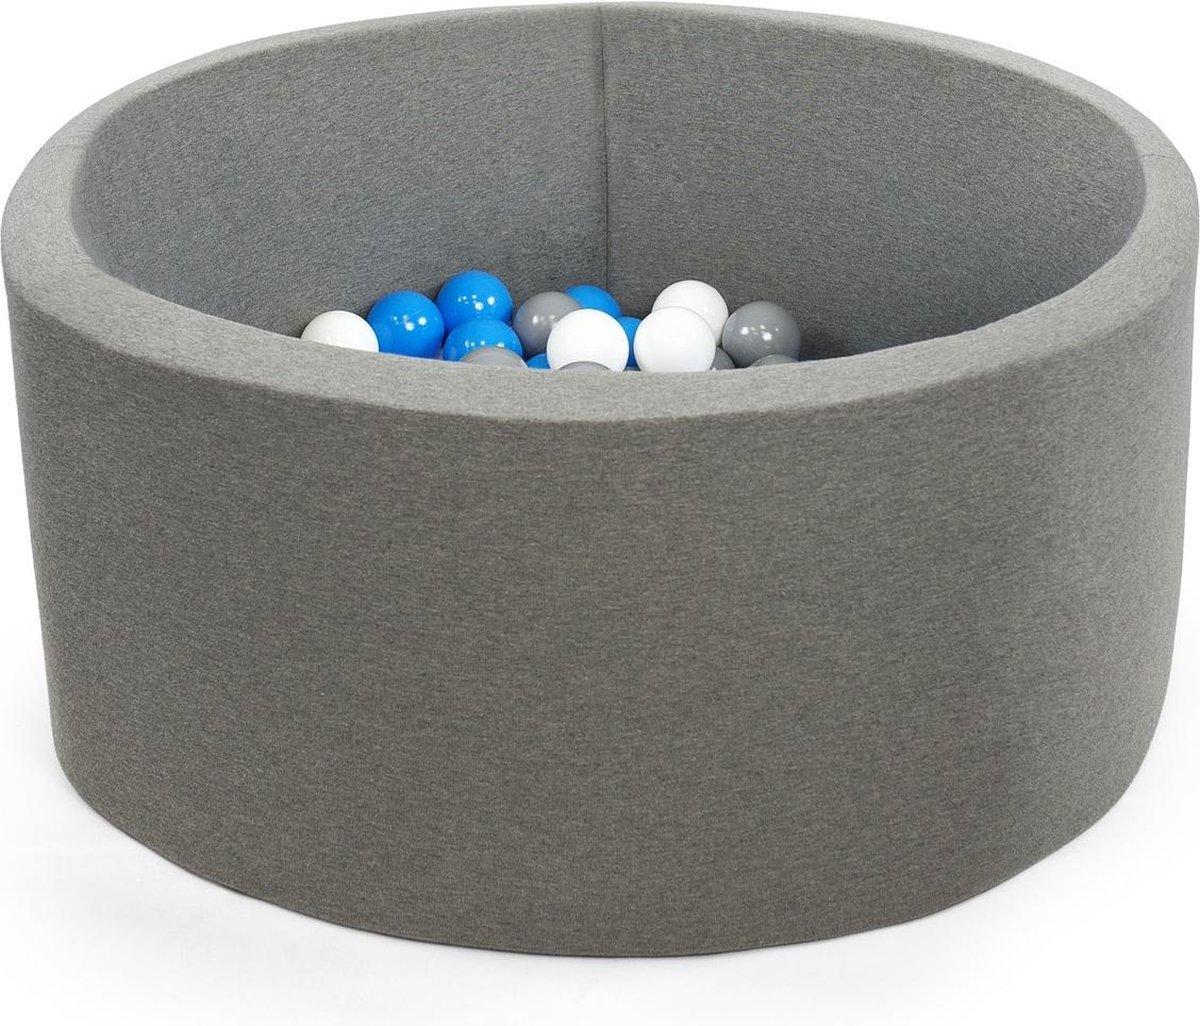 Ballenbak XL rond 90x40 grijs Misioo, excl. ballen